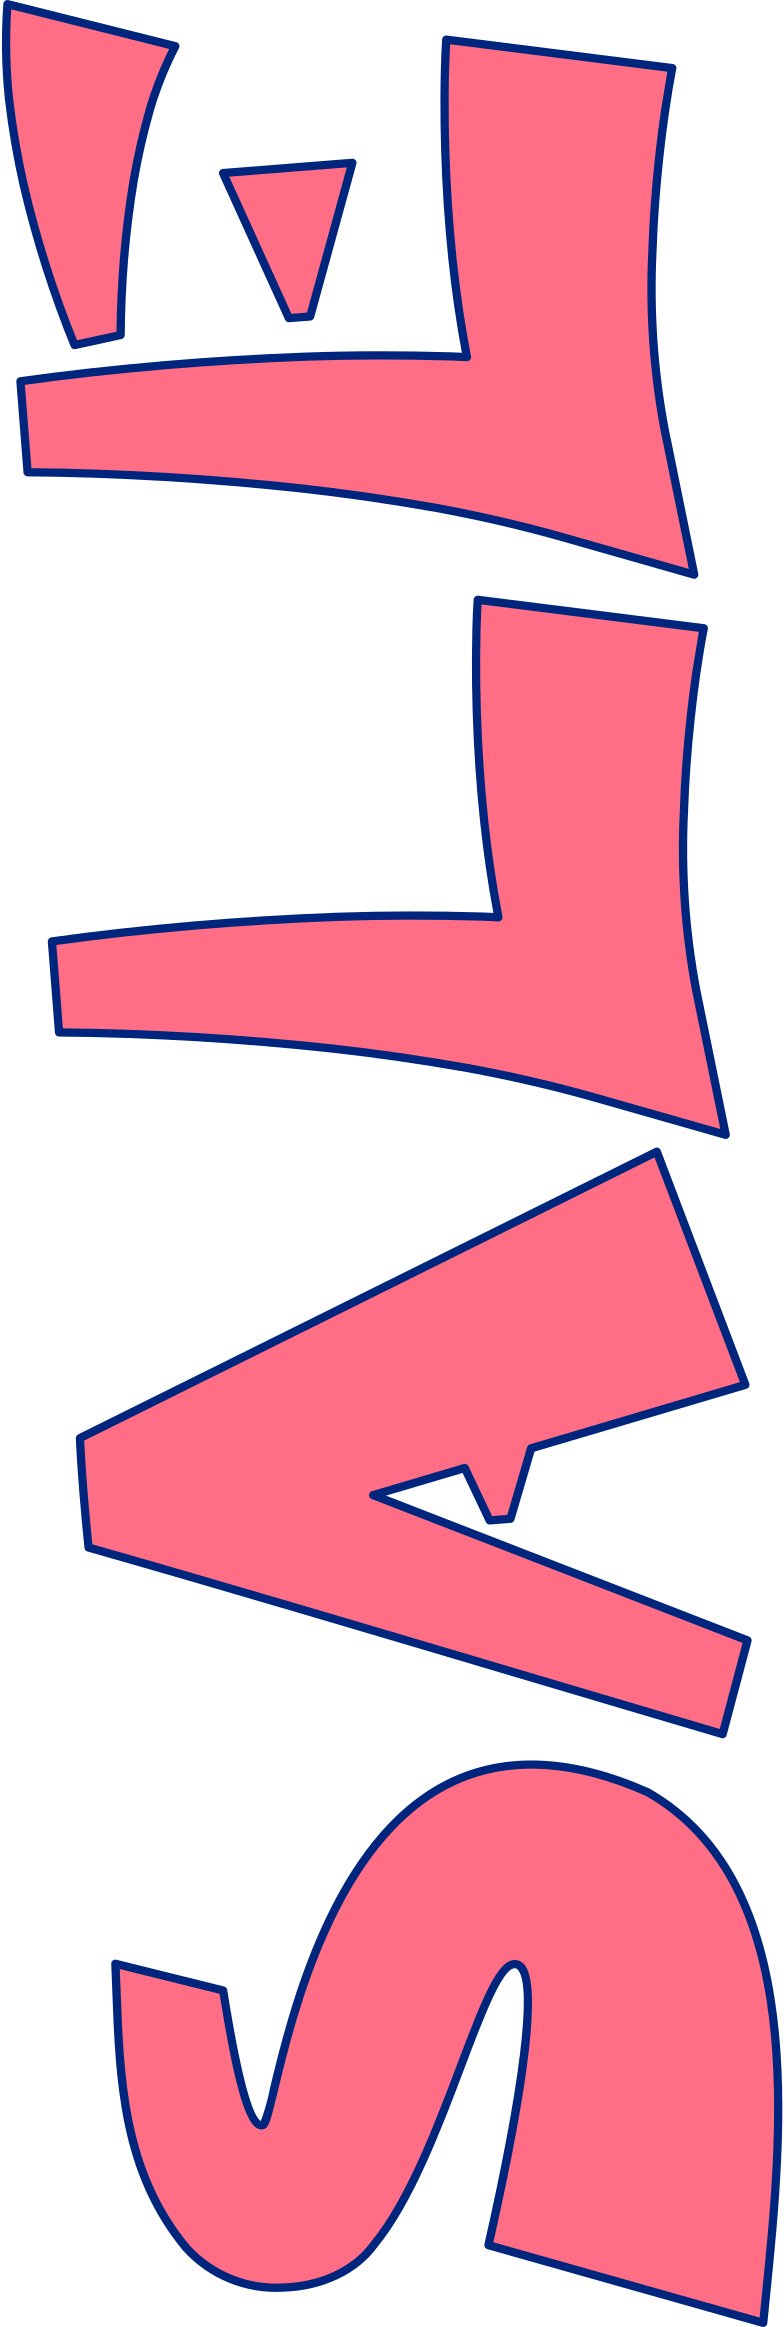 sale word Clipart illustration in PNG, SVG